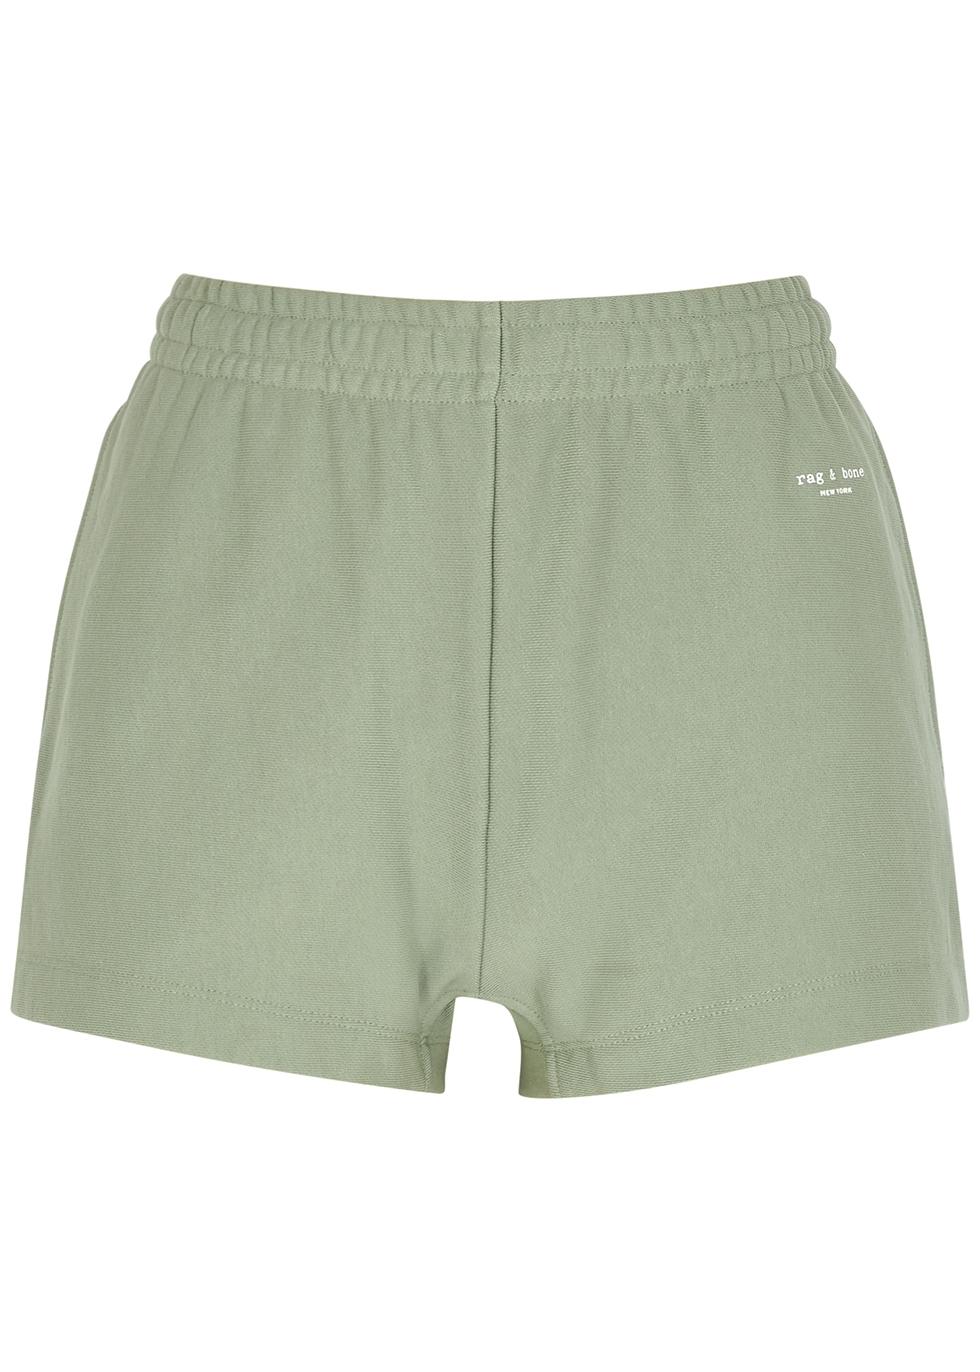 City sage jersey shorts